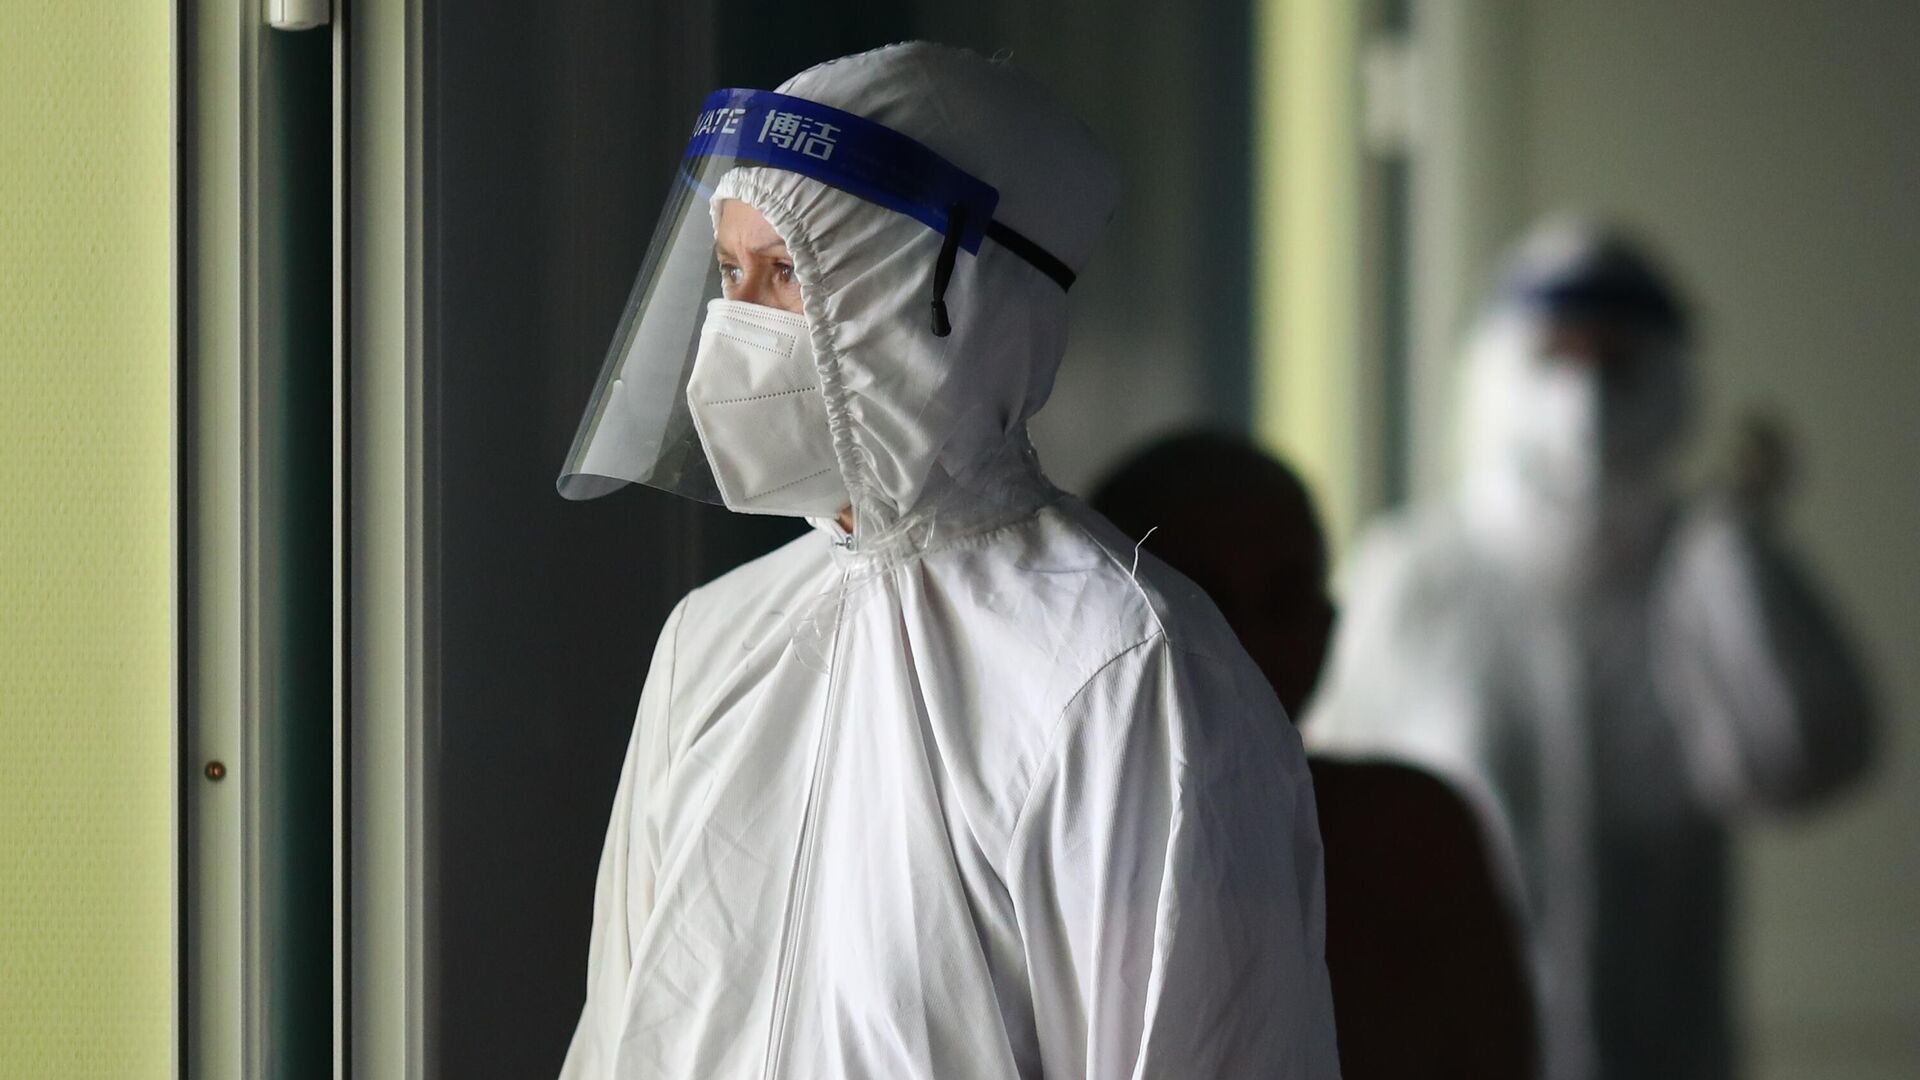 Киселев заявил о щадящем течении COVID-19 у себя благодаря прививке